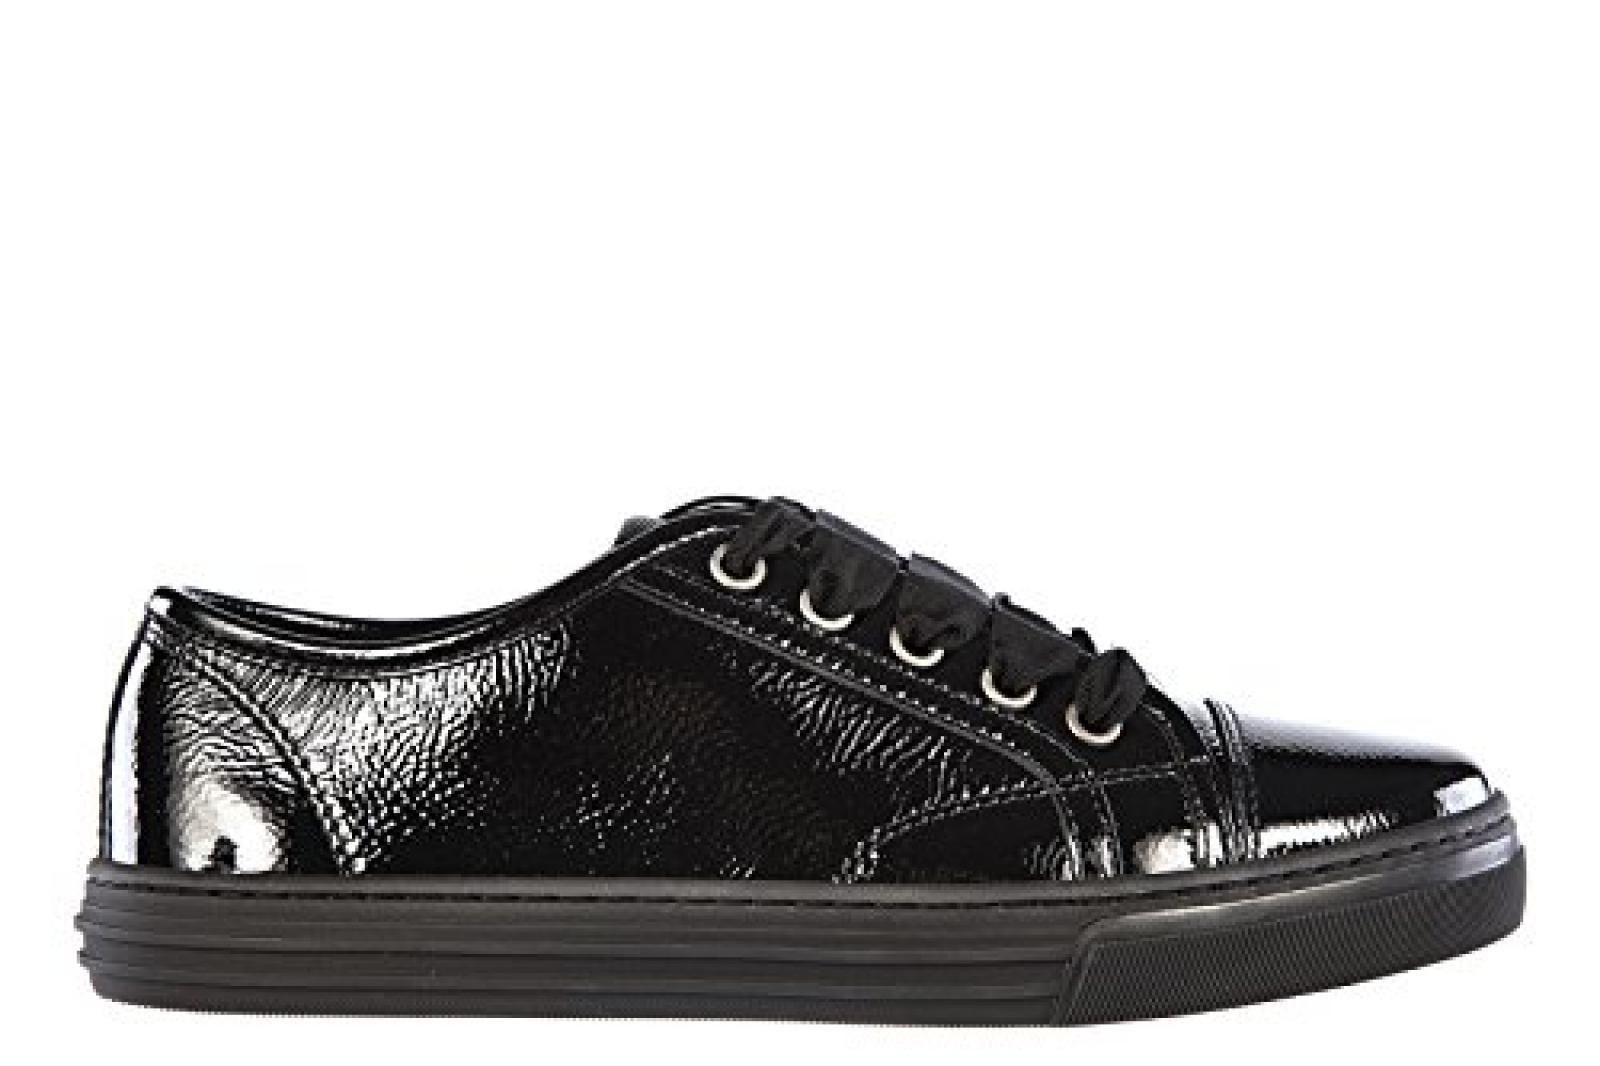 Gucci Damenschuhe Turnschuhe Damen Leder Schuhe Sneakers naplack Schwarz